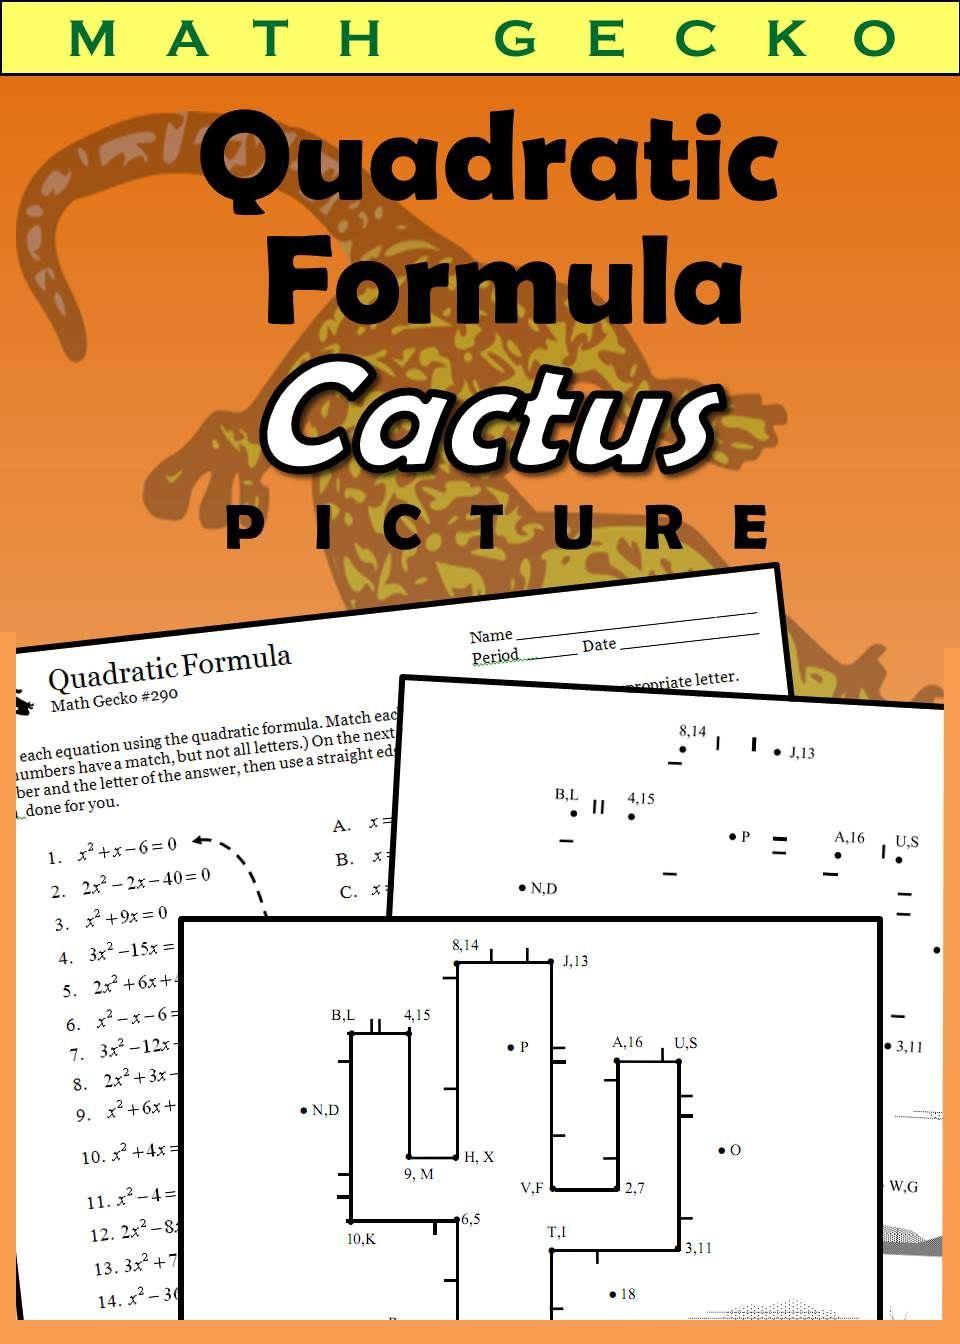 Quadratic Formula Picture Cactus Quadratic Formula Quadratics Teaching Algebra How to verify that addition is